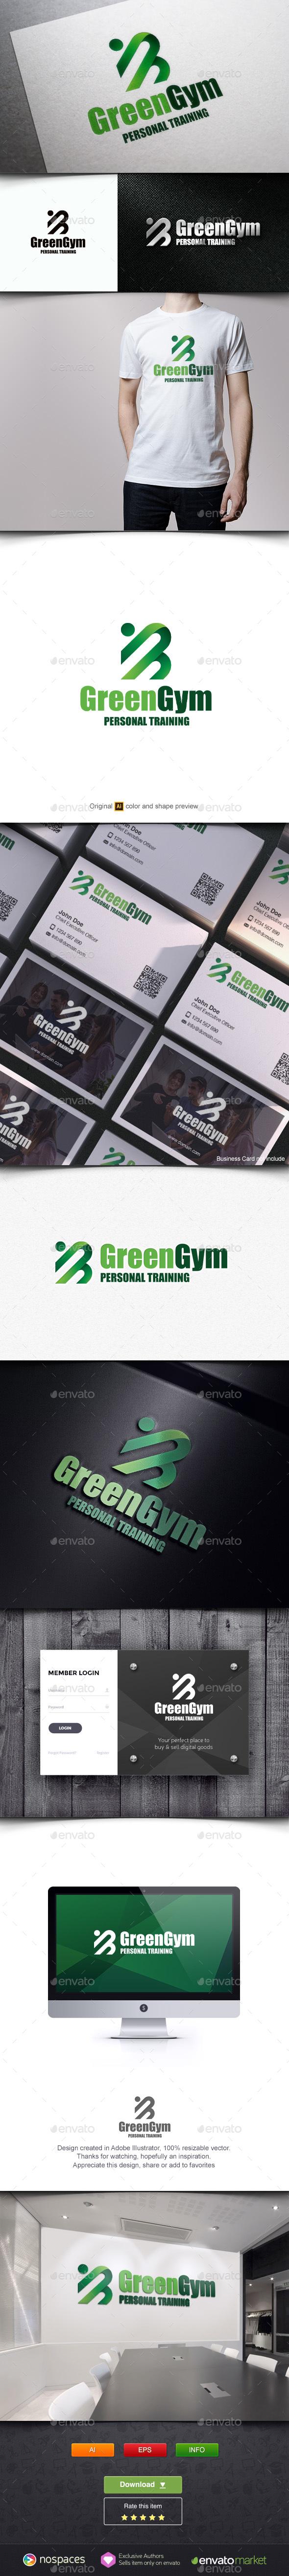 Green Gym Logo